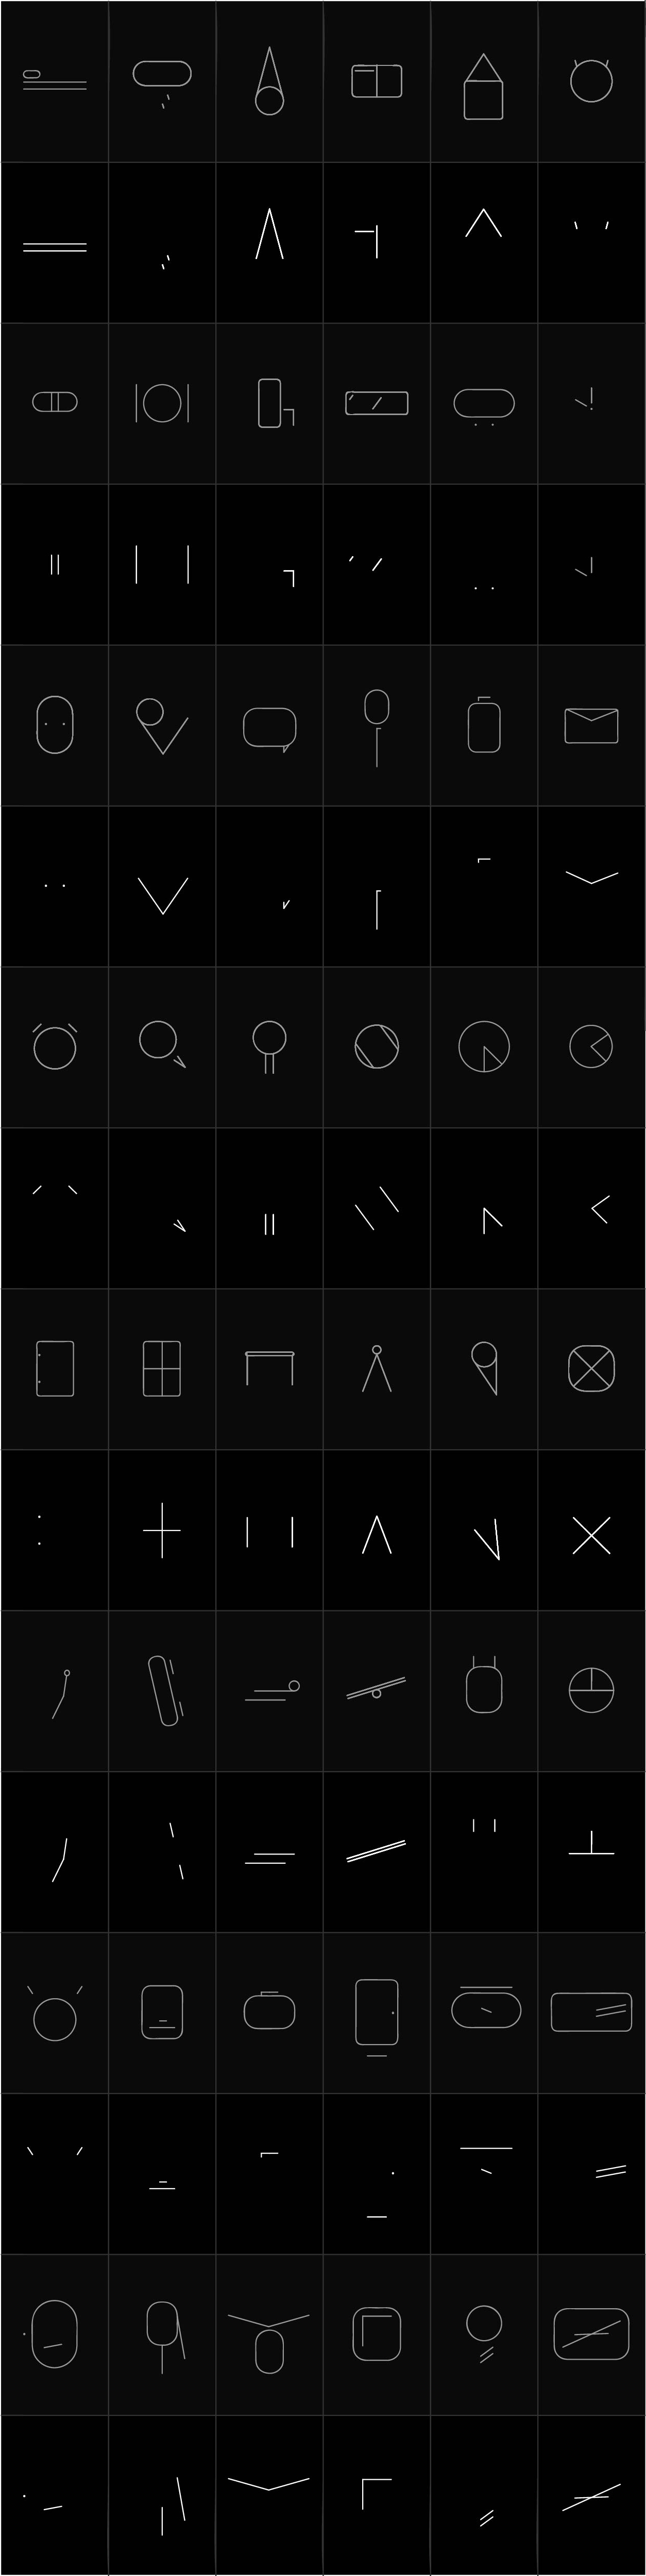 final test icons2.jpg